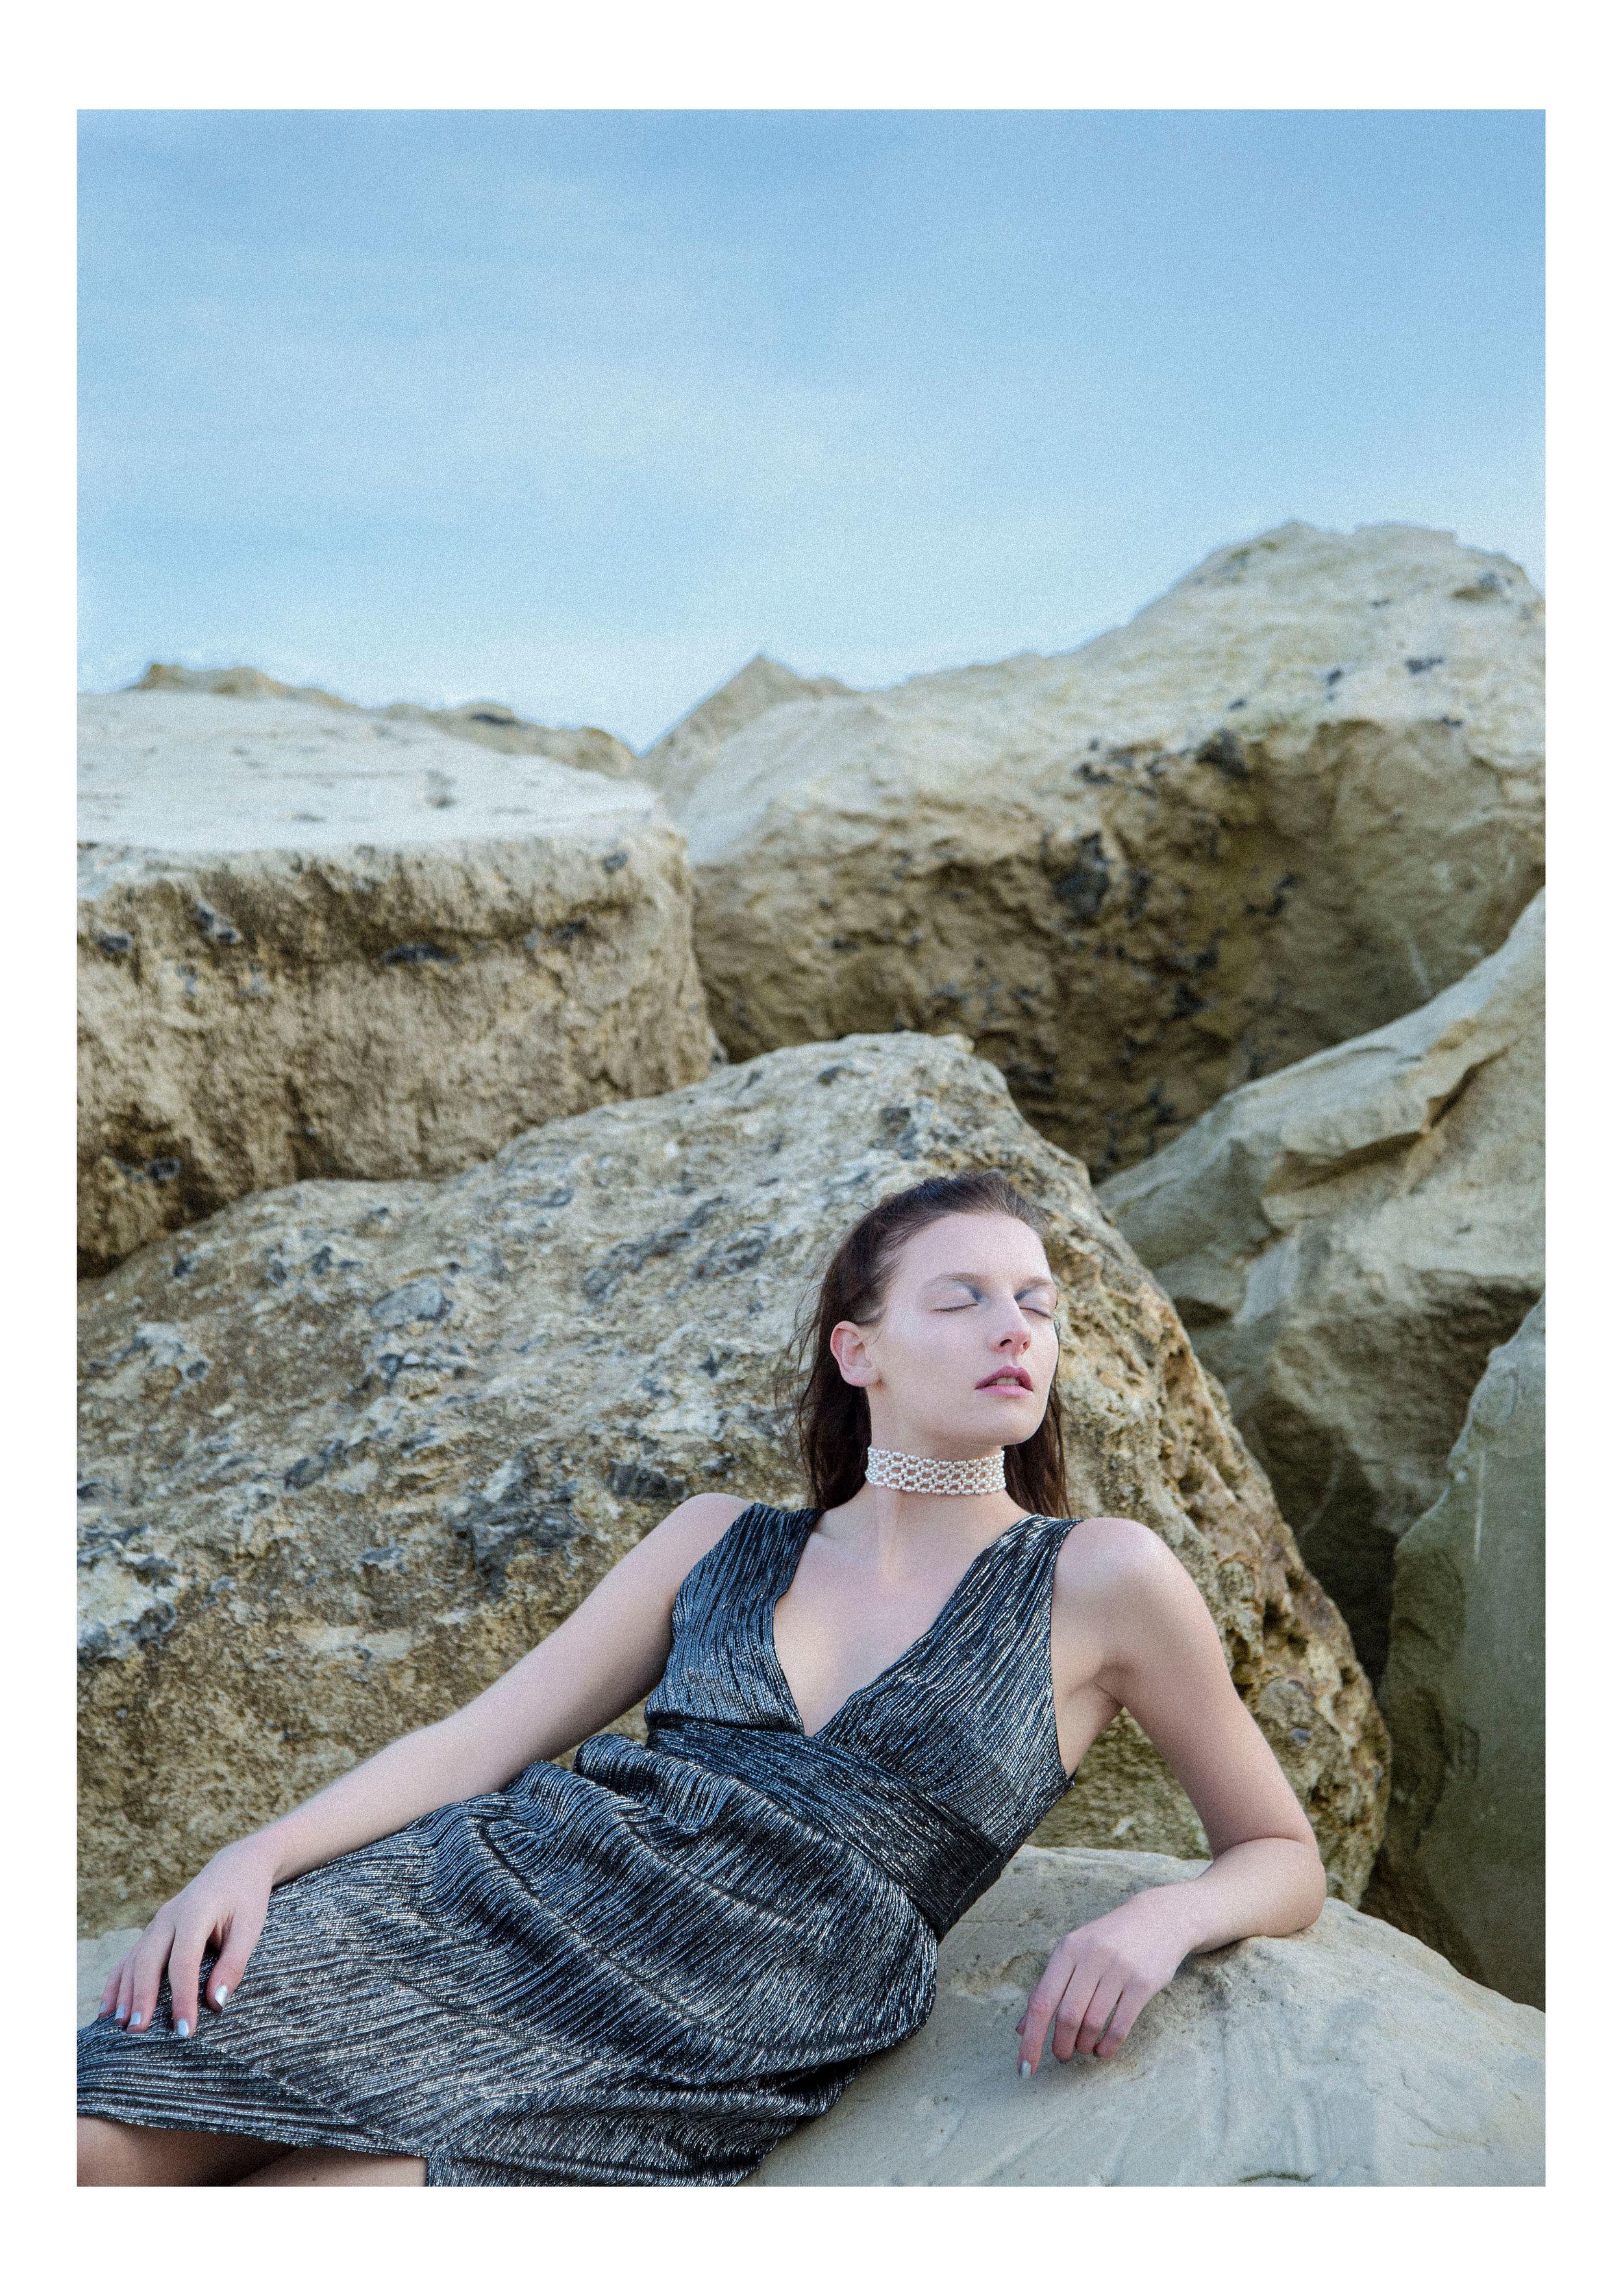 Modern Mermaid Series  Model: Chloe Hutchings  MUA: Alice Simpson  Hair Stylist: Abby Bryan  Stylist: Rosie Dalton  Assistants: Becky Irons & Natasha Brett